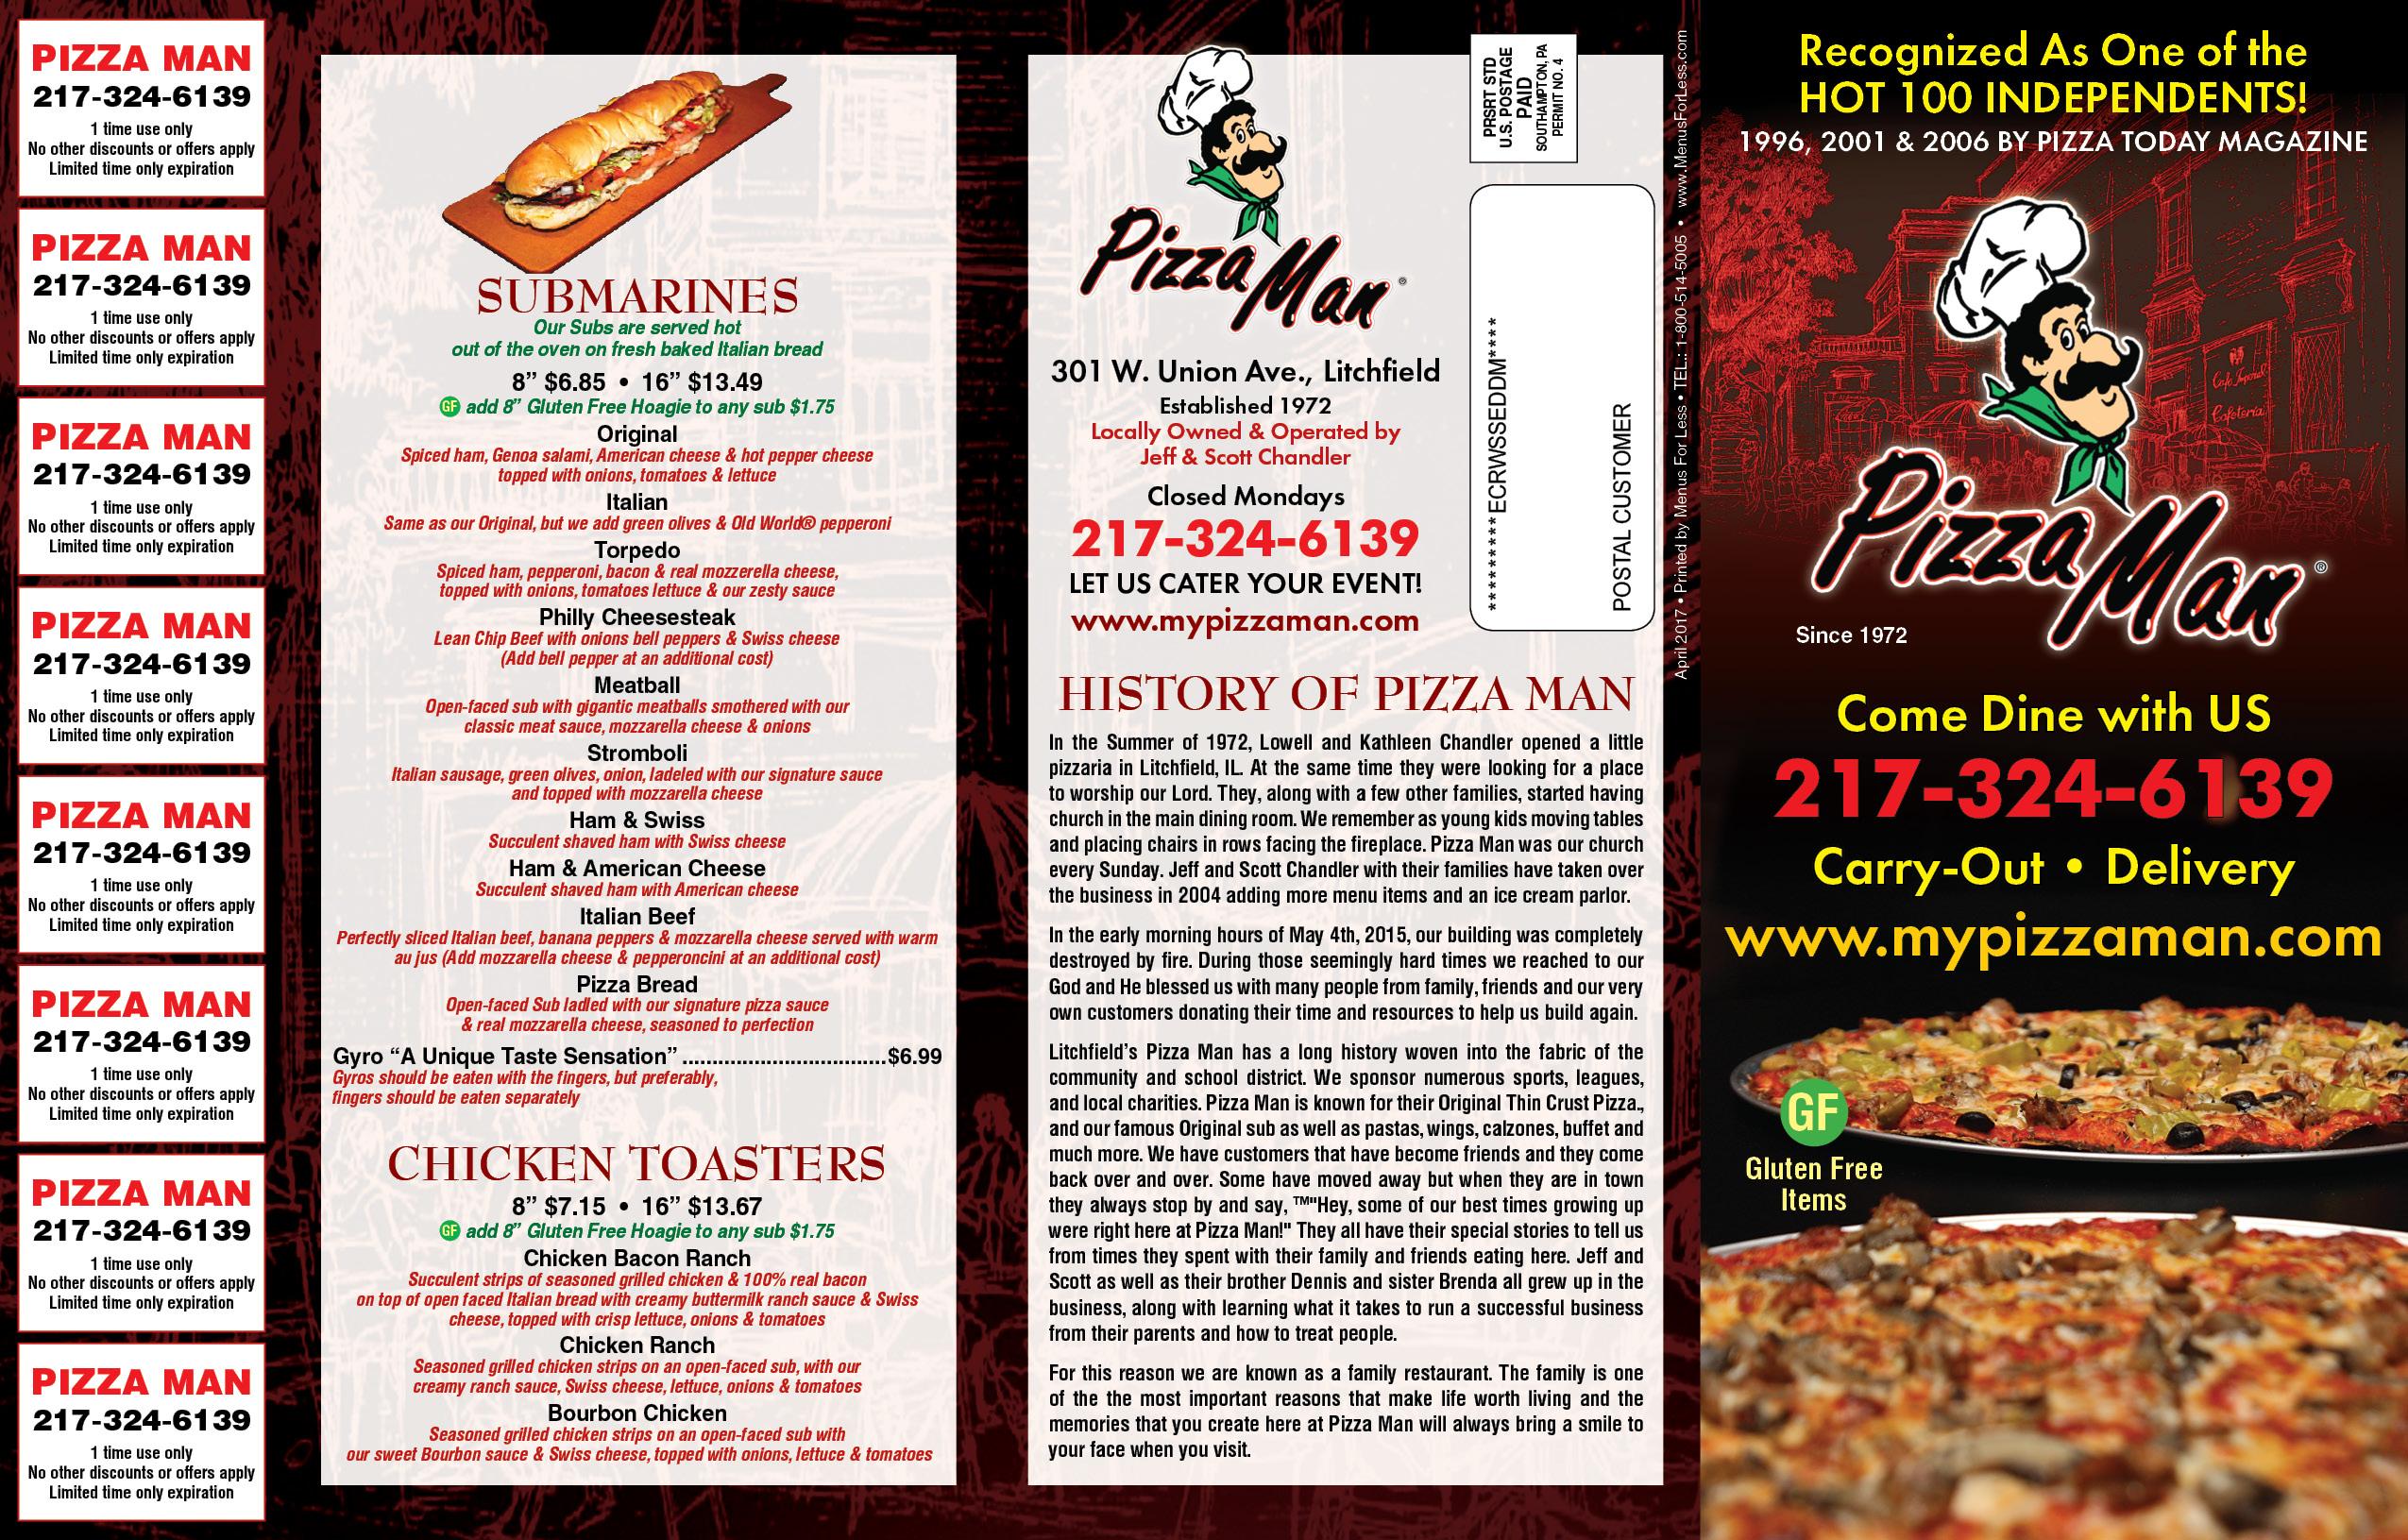 JPEG MENUS | Pizza Man